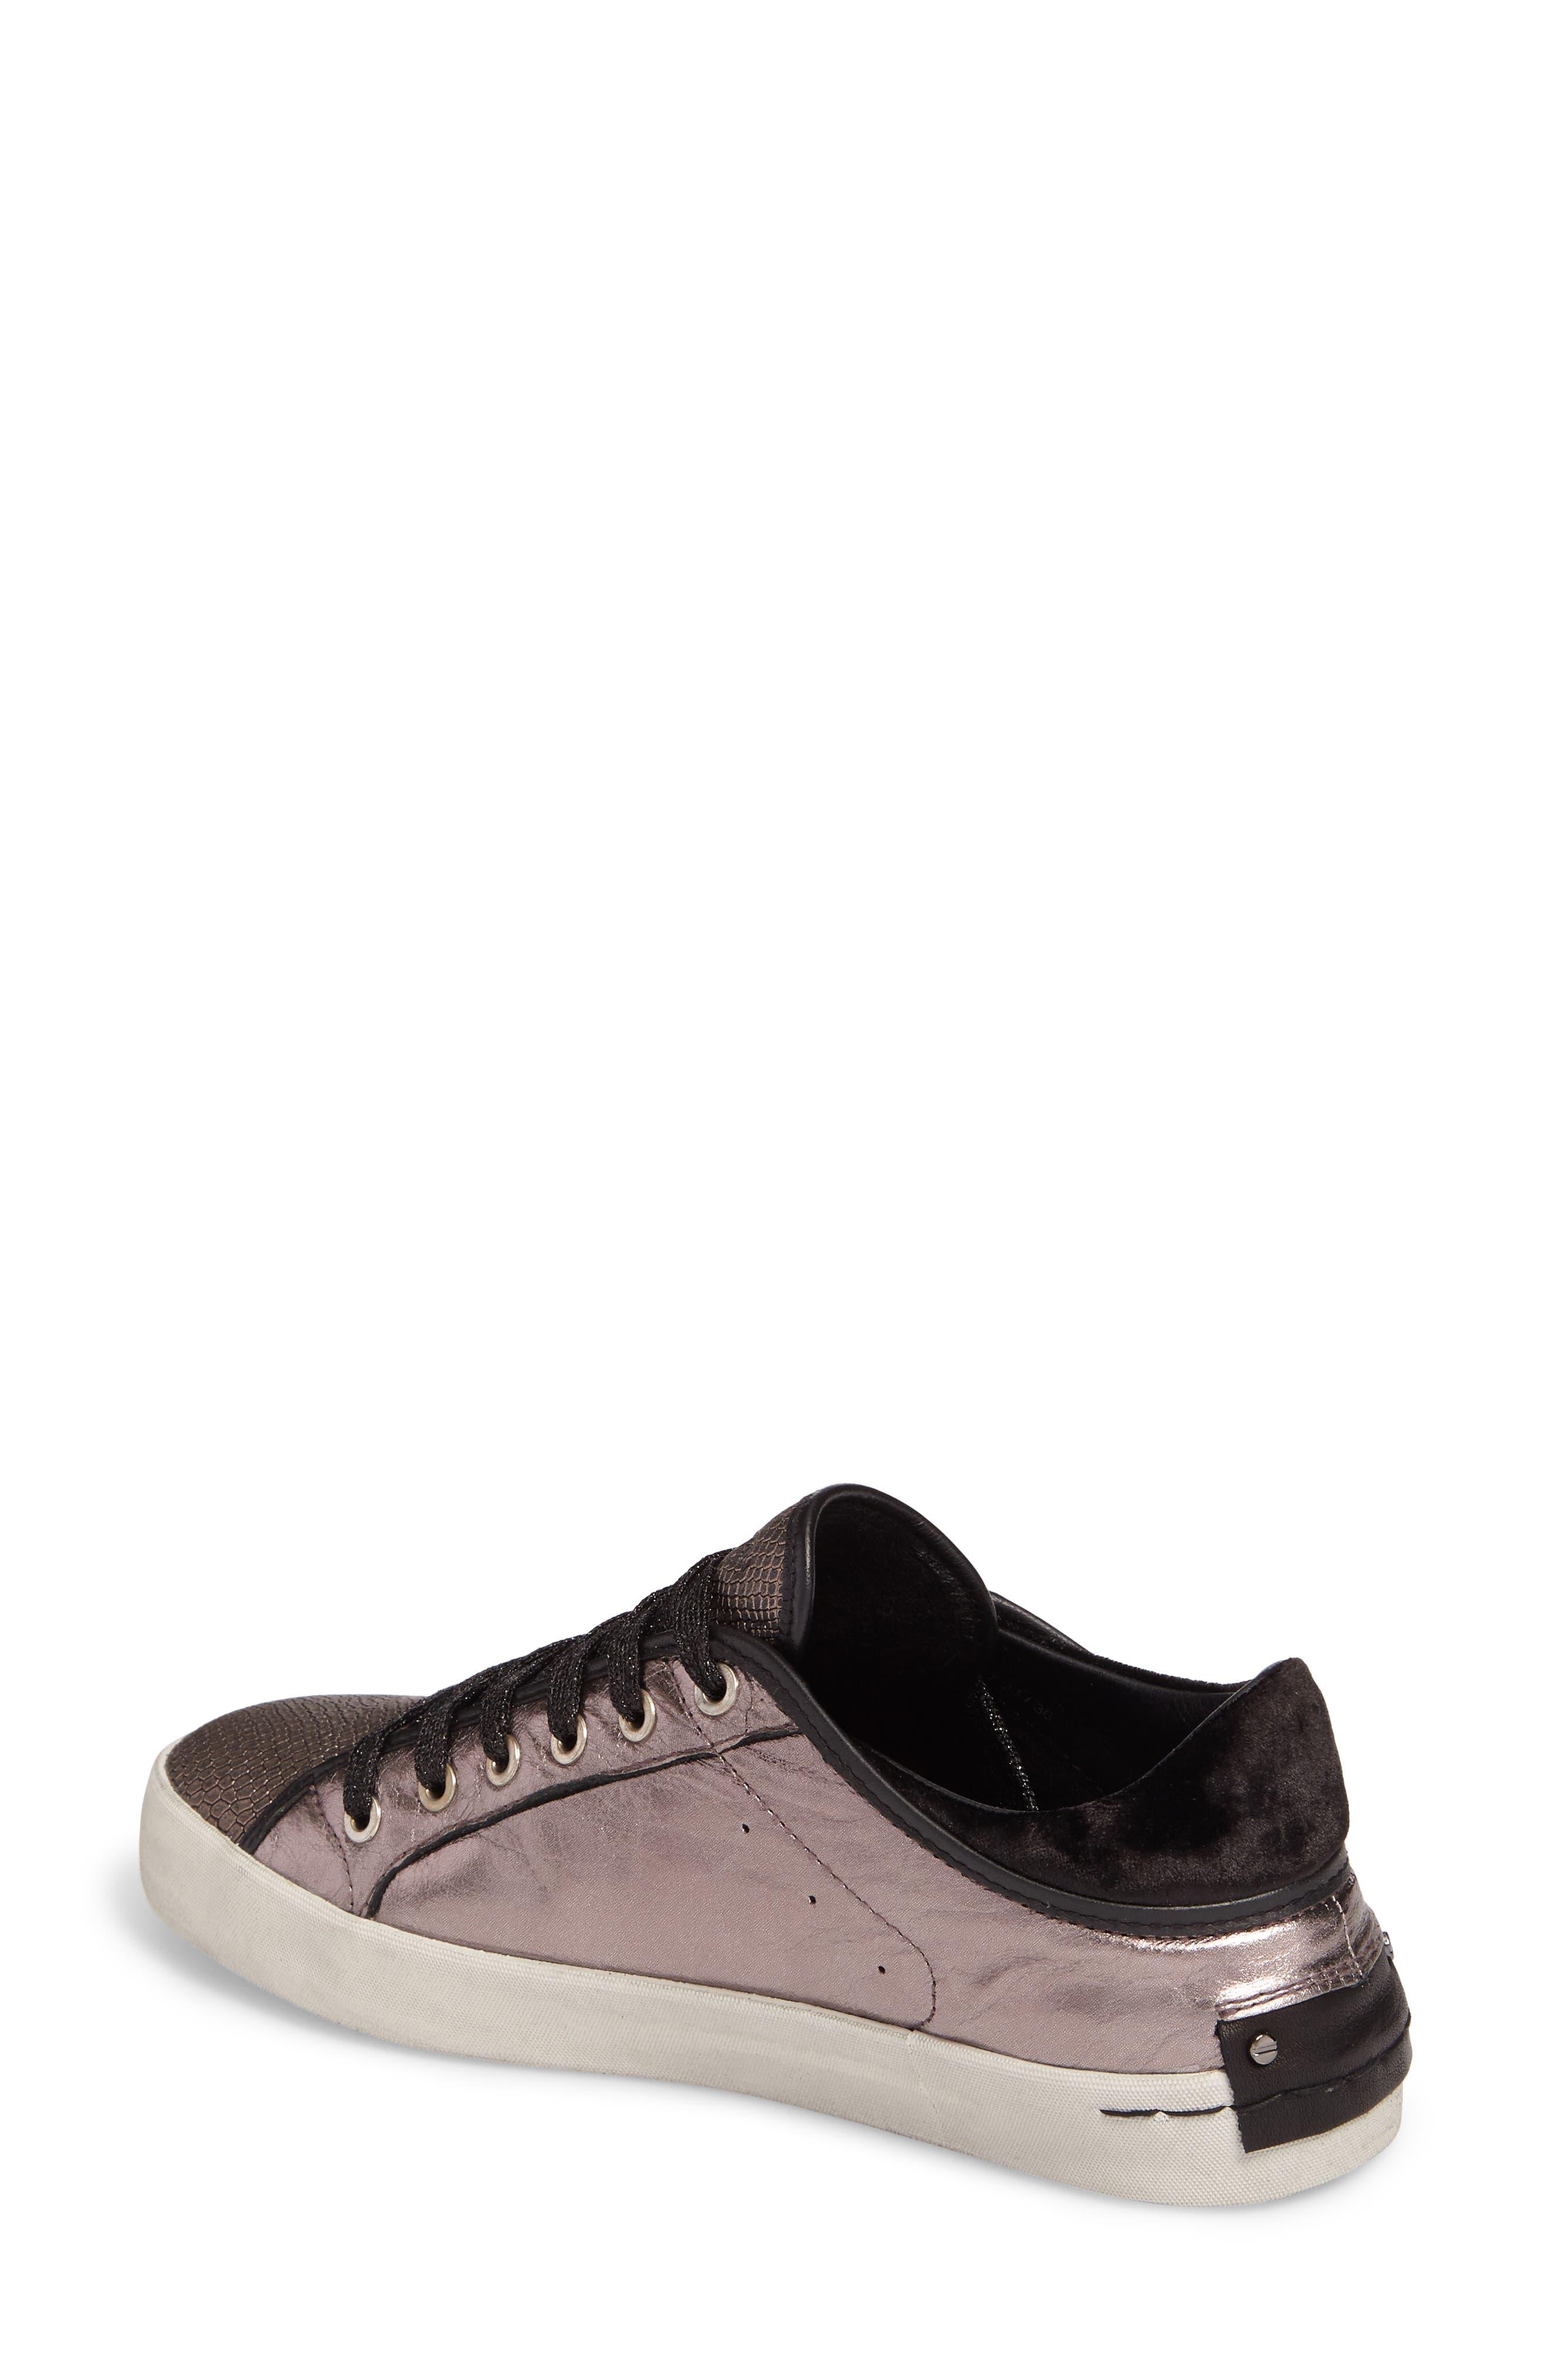 Faith Sneaker,                             Alternate thumbnail 2, color,                             040